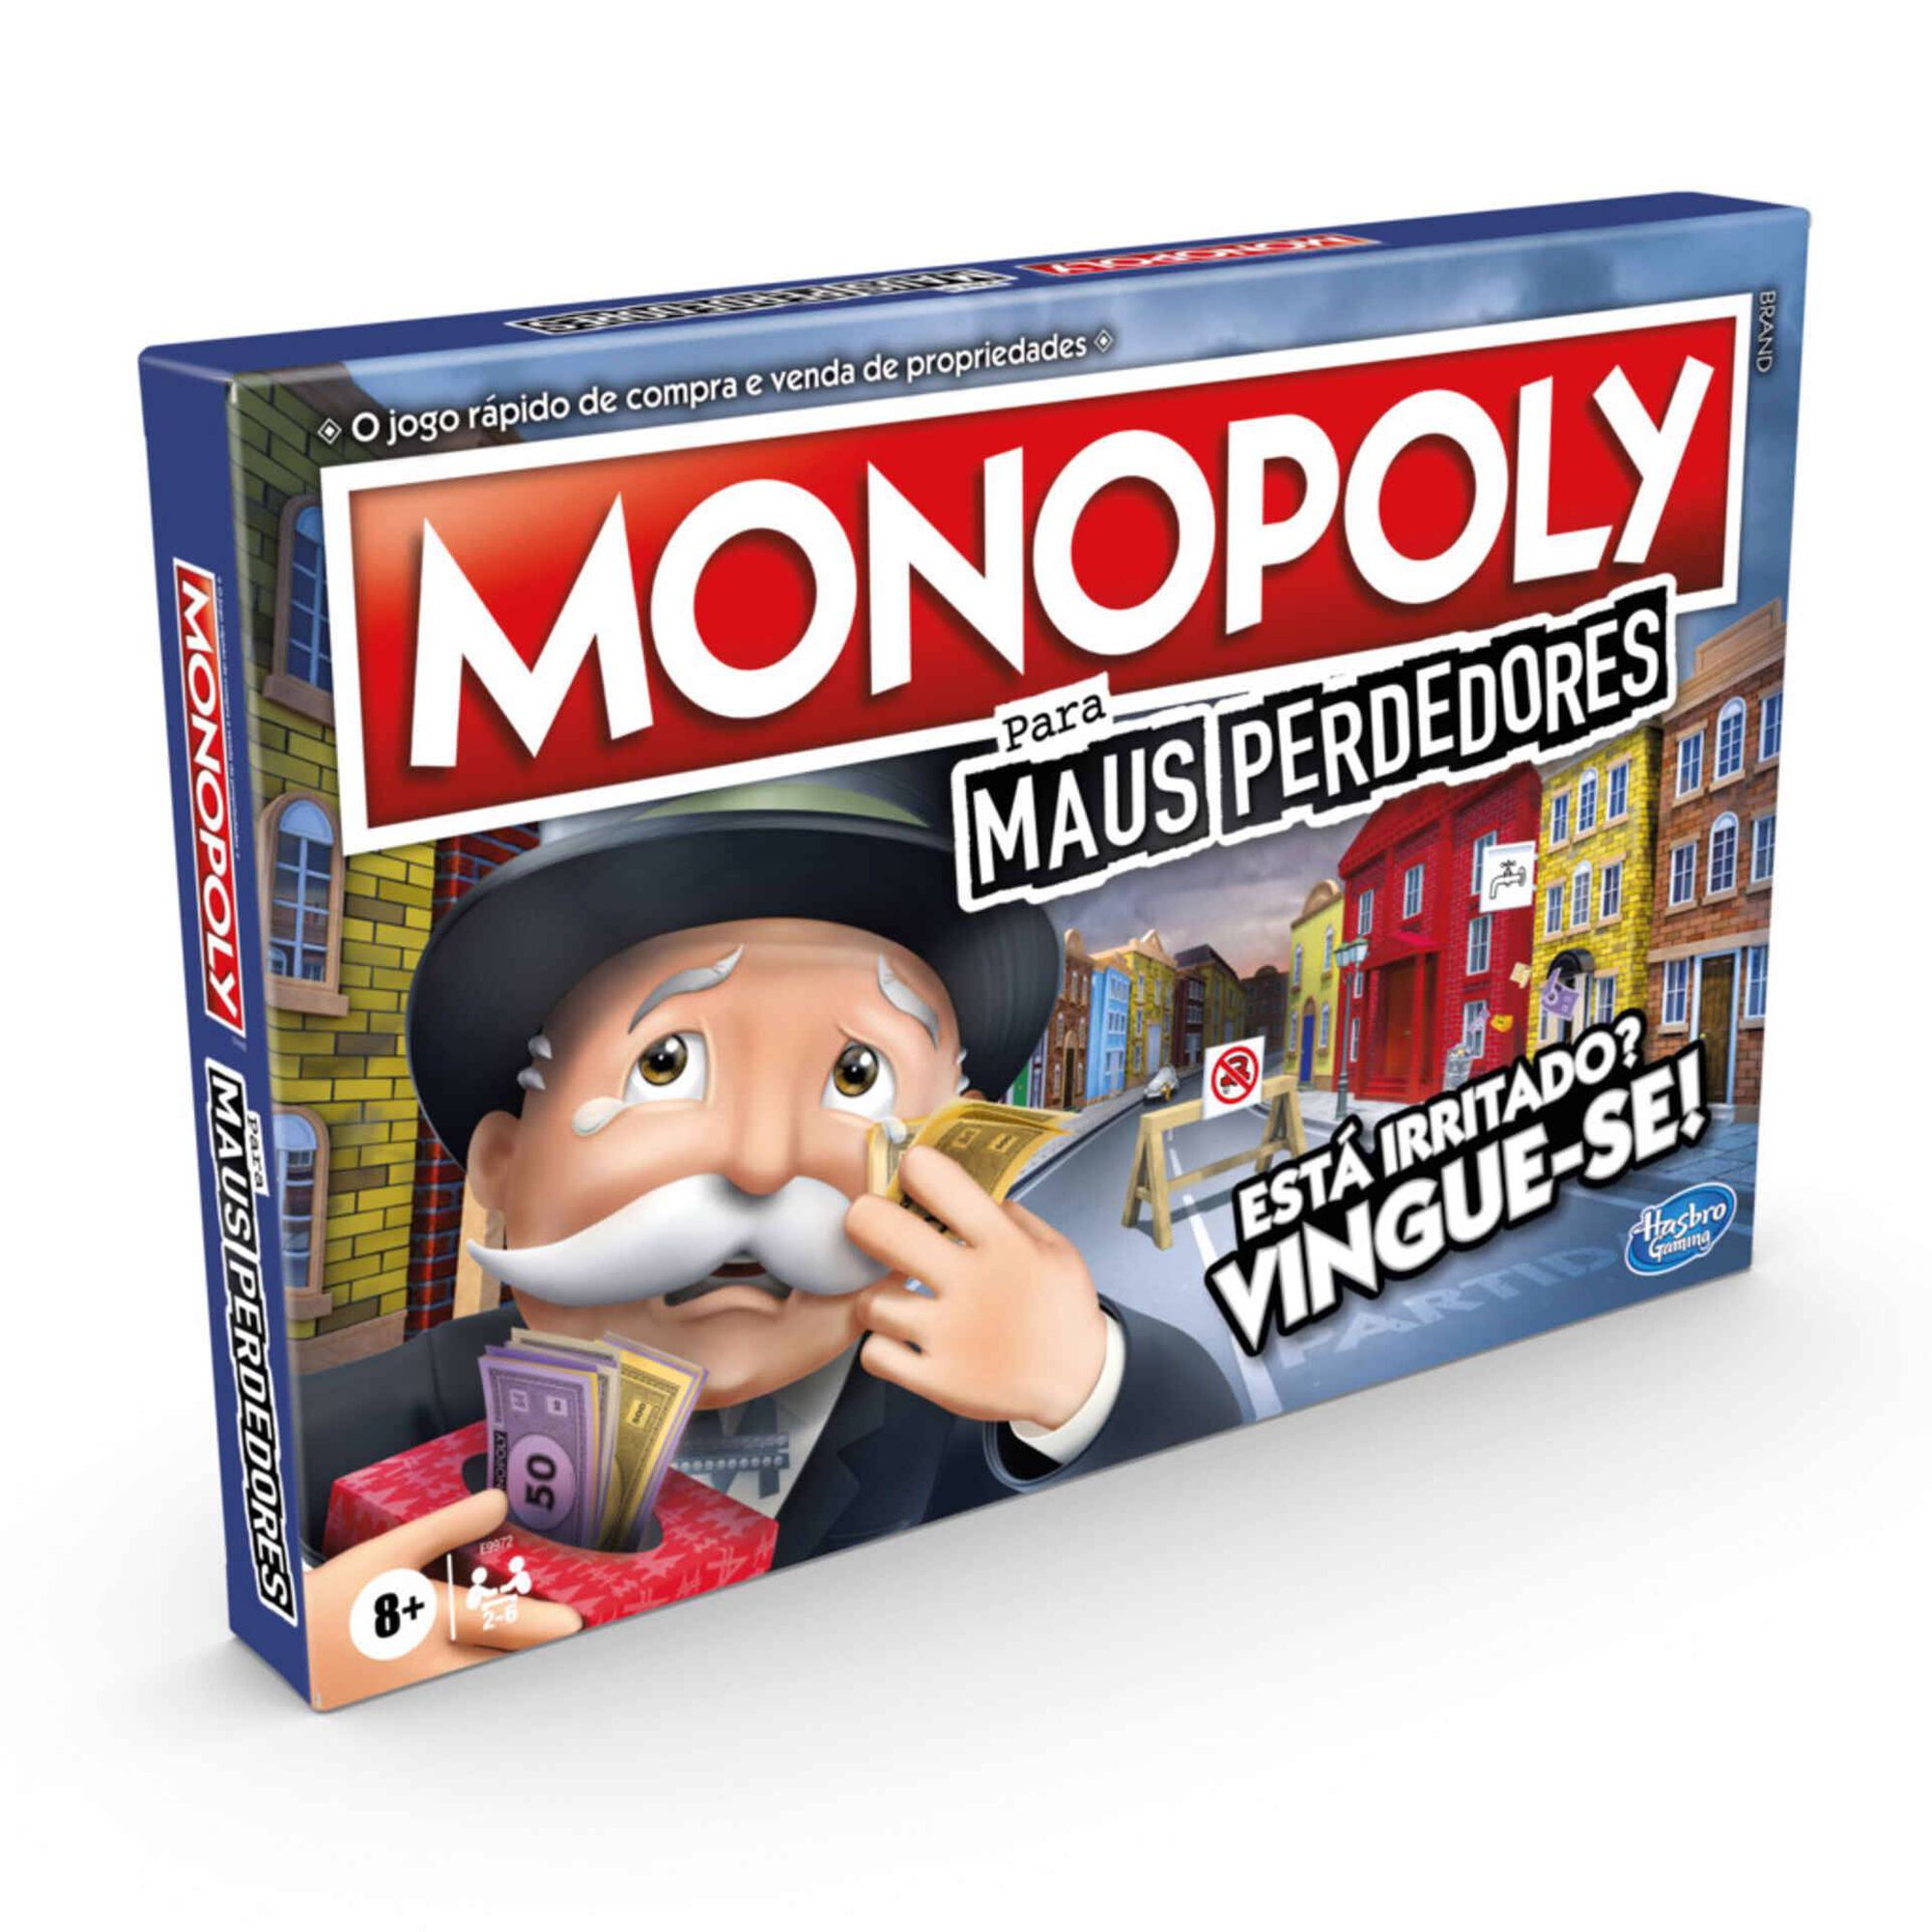 Monopoly Mau Perdedor